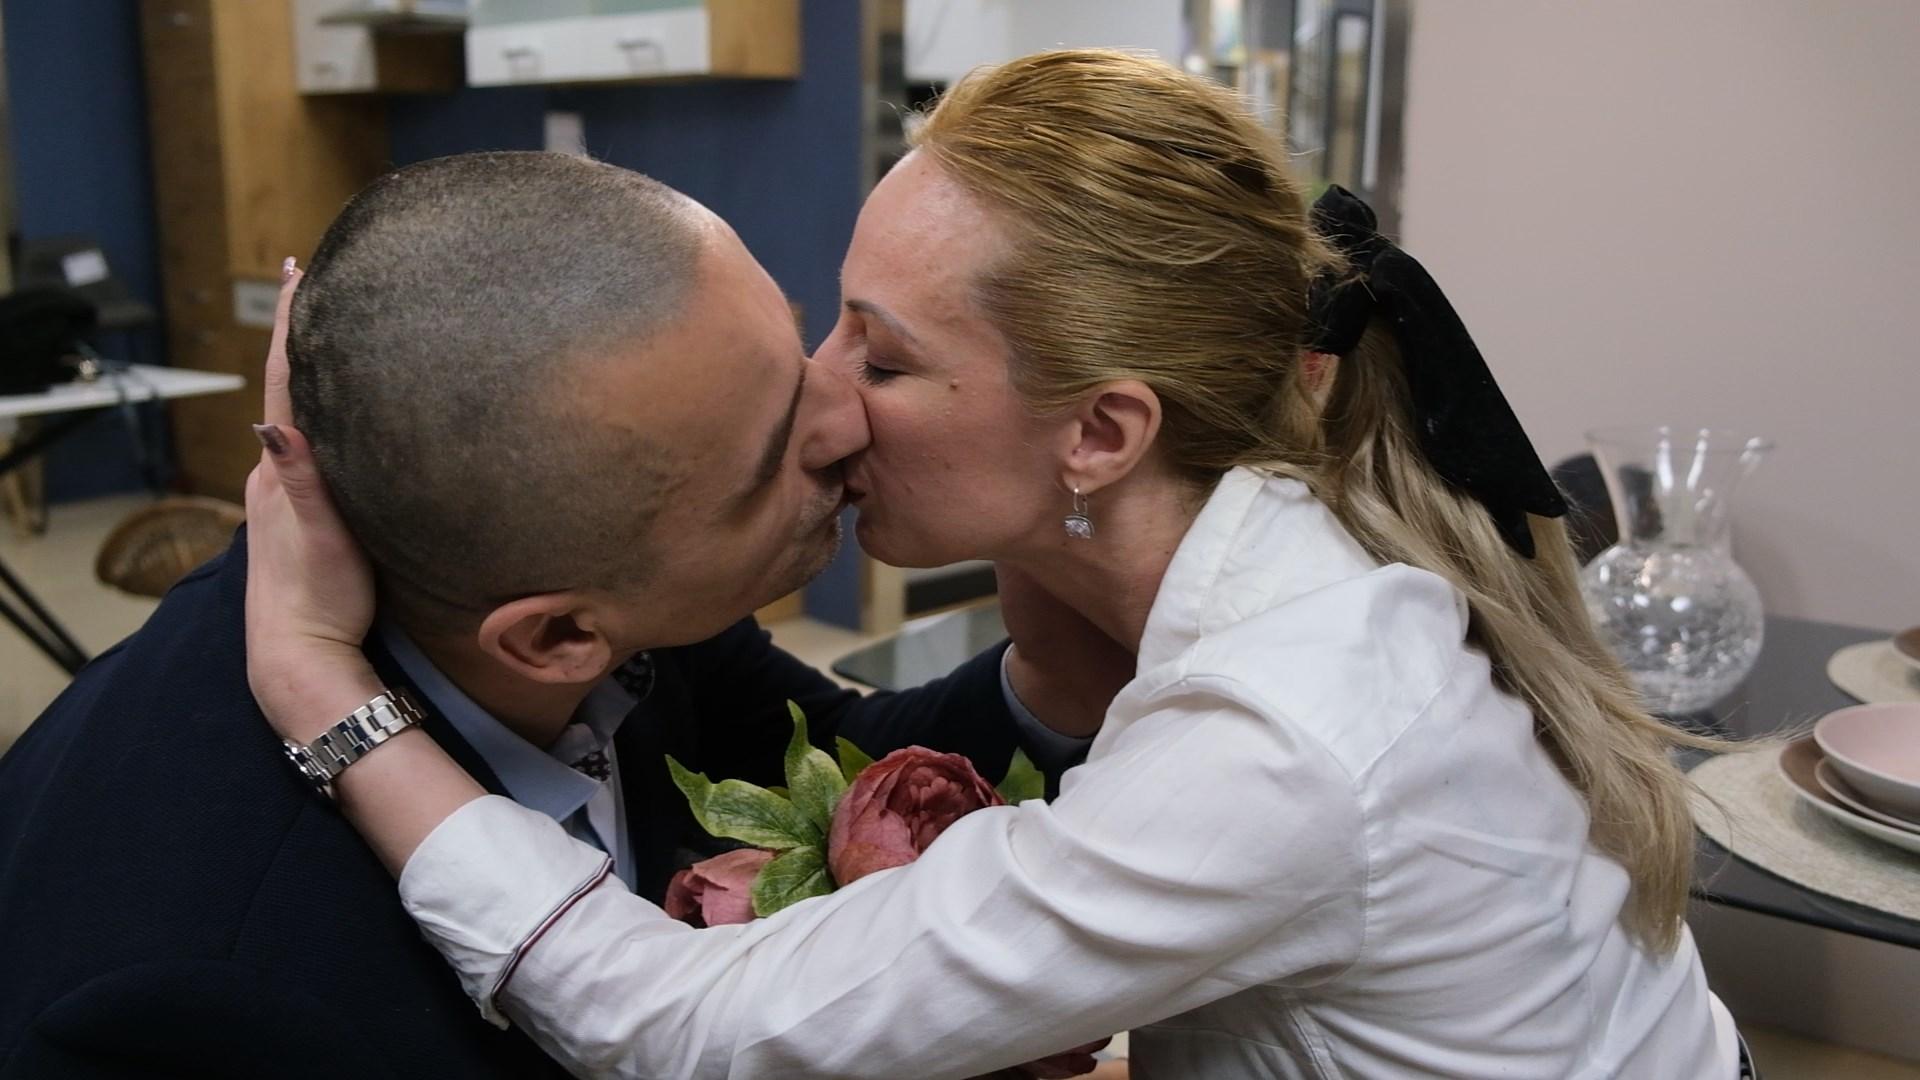 Extravagant couple: Ines i Marko Krečak